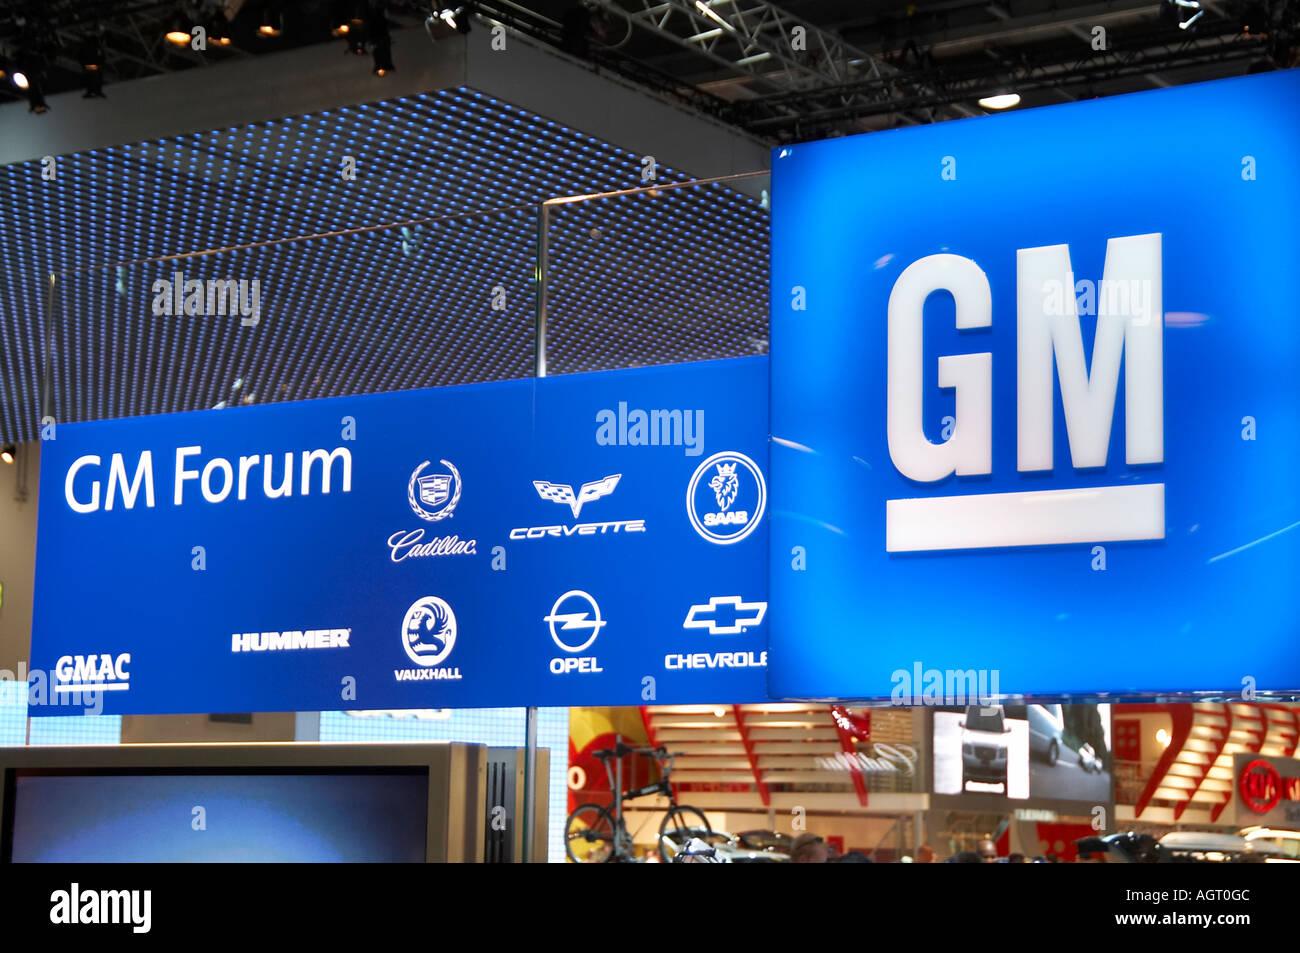 General, motors, gm, car, maker, global, brands, Saab, Chevrolet, opel, Vauxhall, Cadillac, hummer, corvette, Holden, manufactur - Stock Image